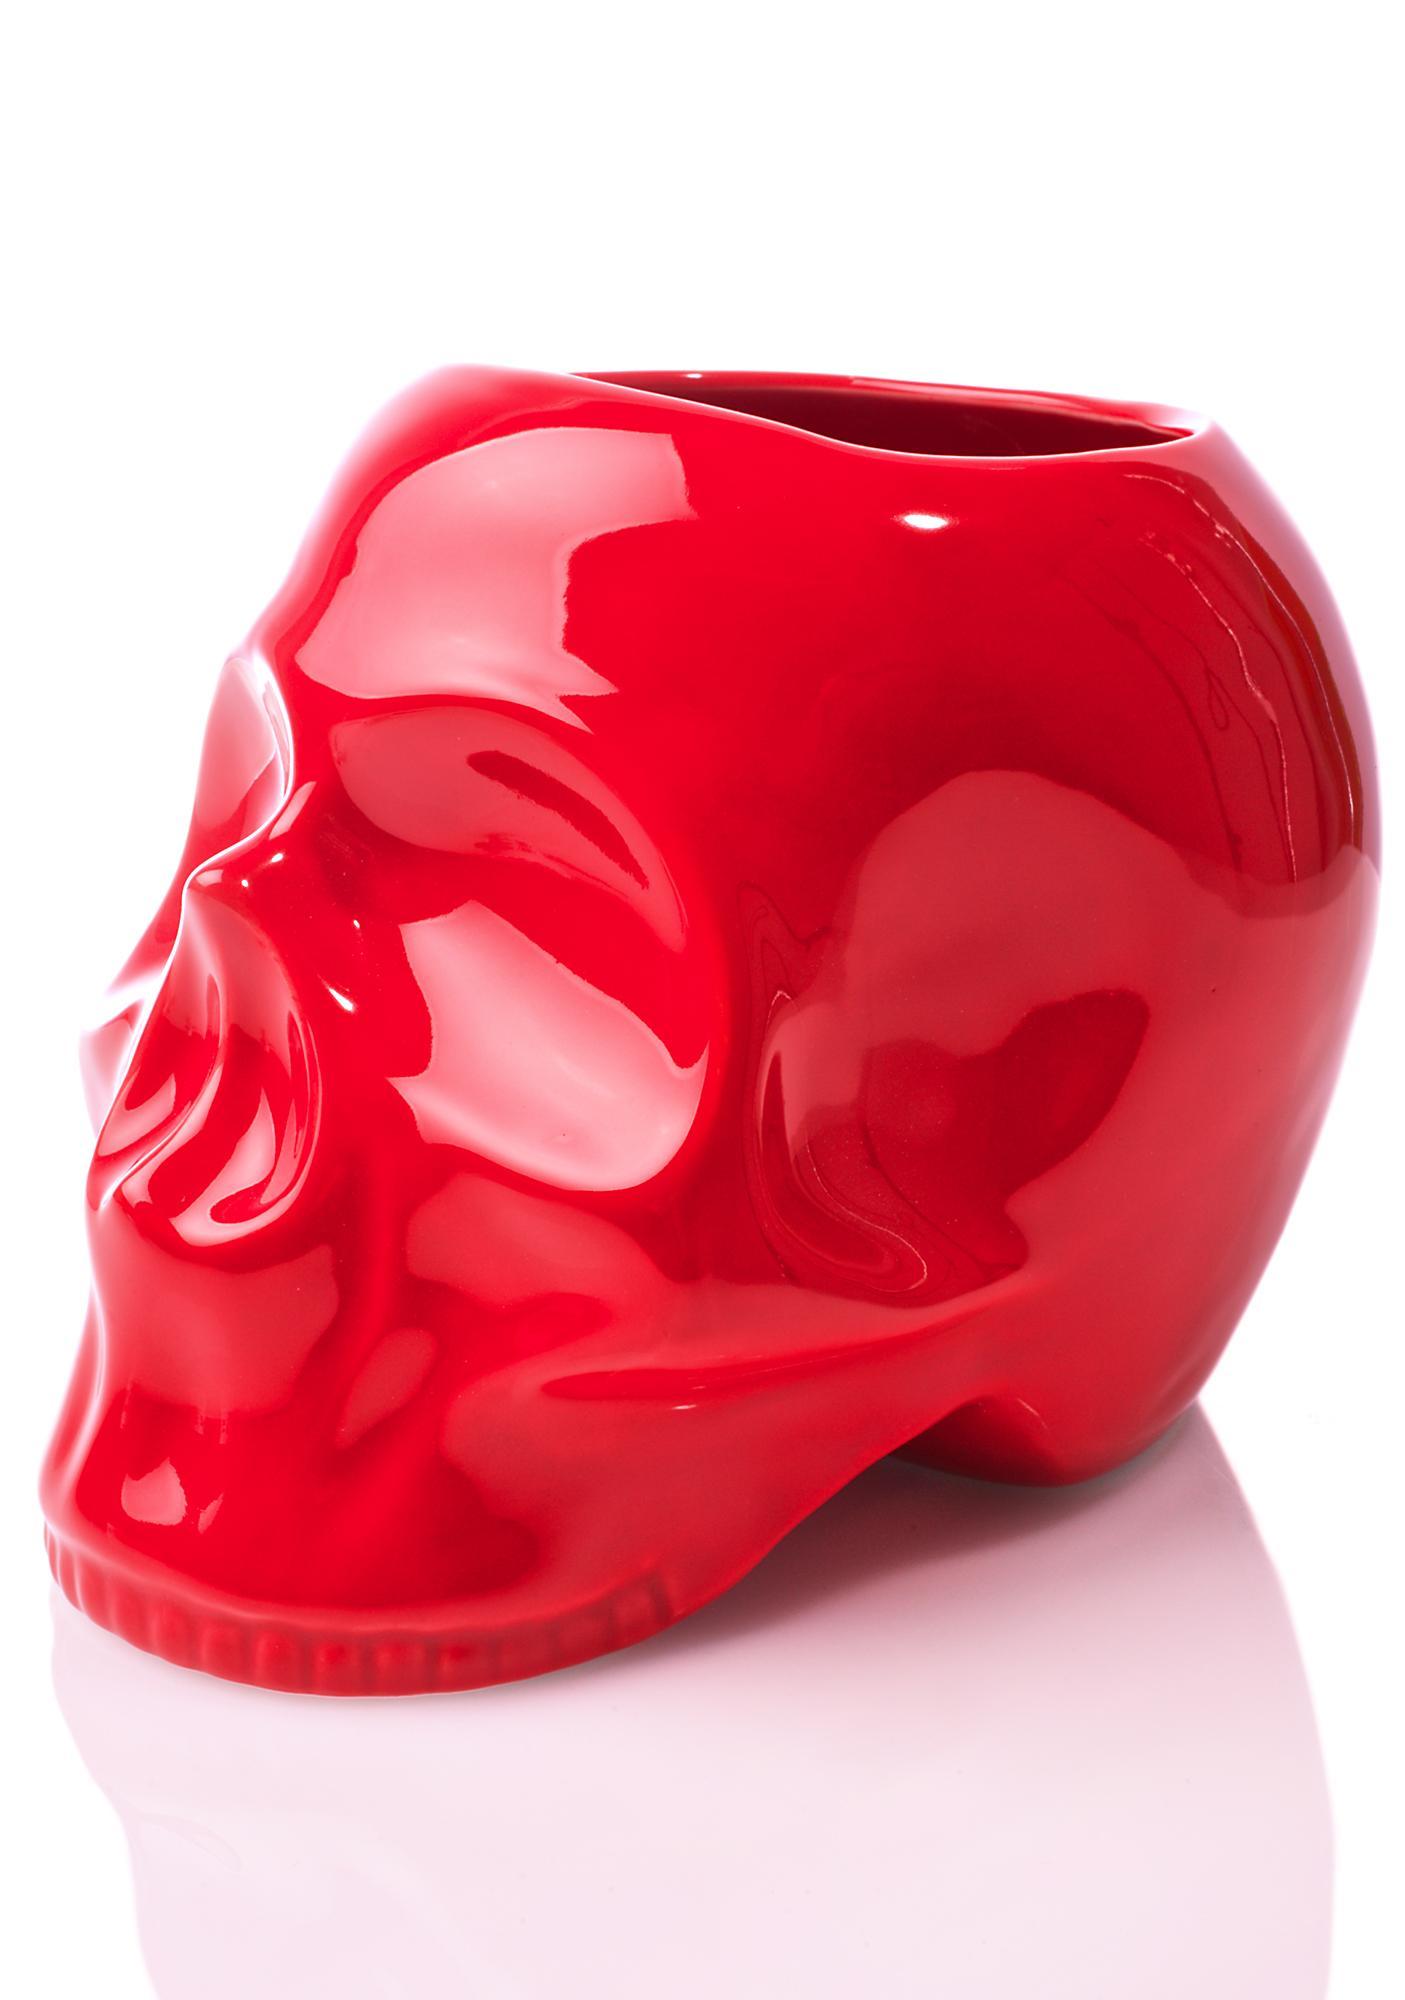 Sourpuss Clothing Skull Planter